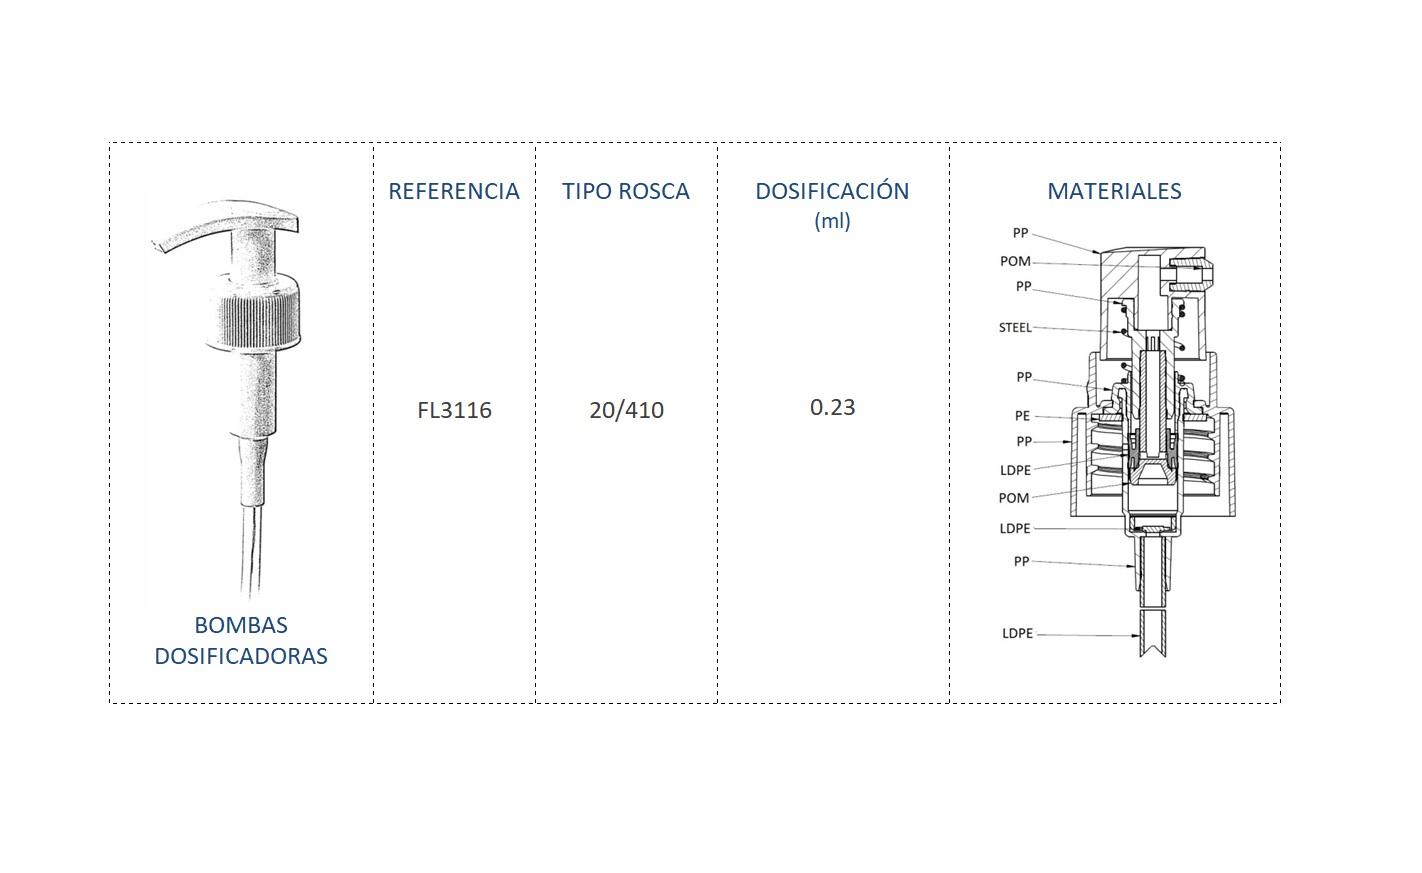 Cuadro de materiales bomba dosificadora FL3116 20/410